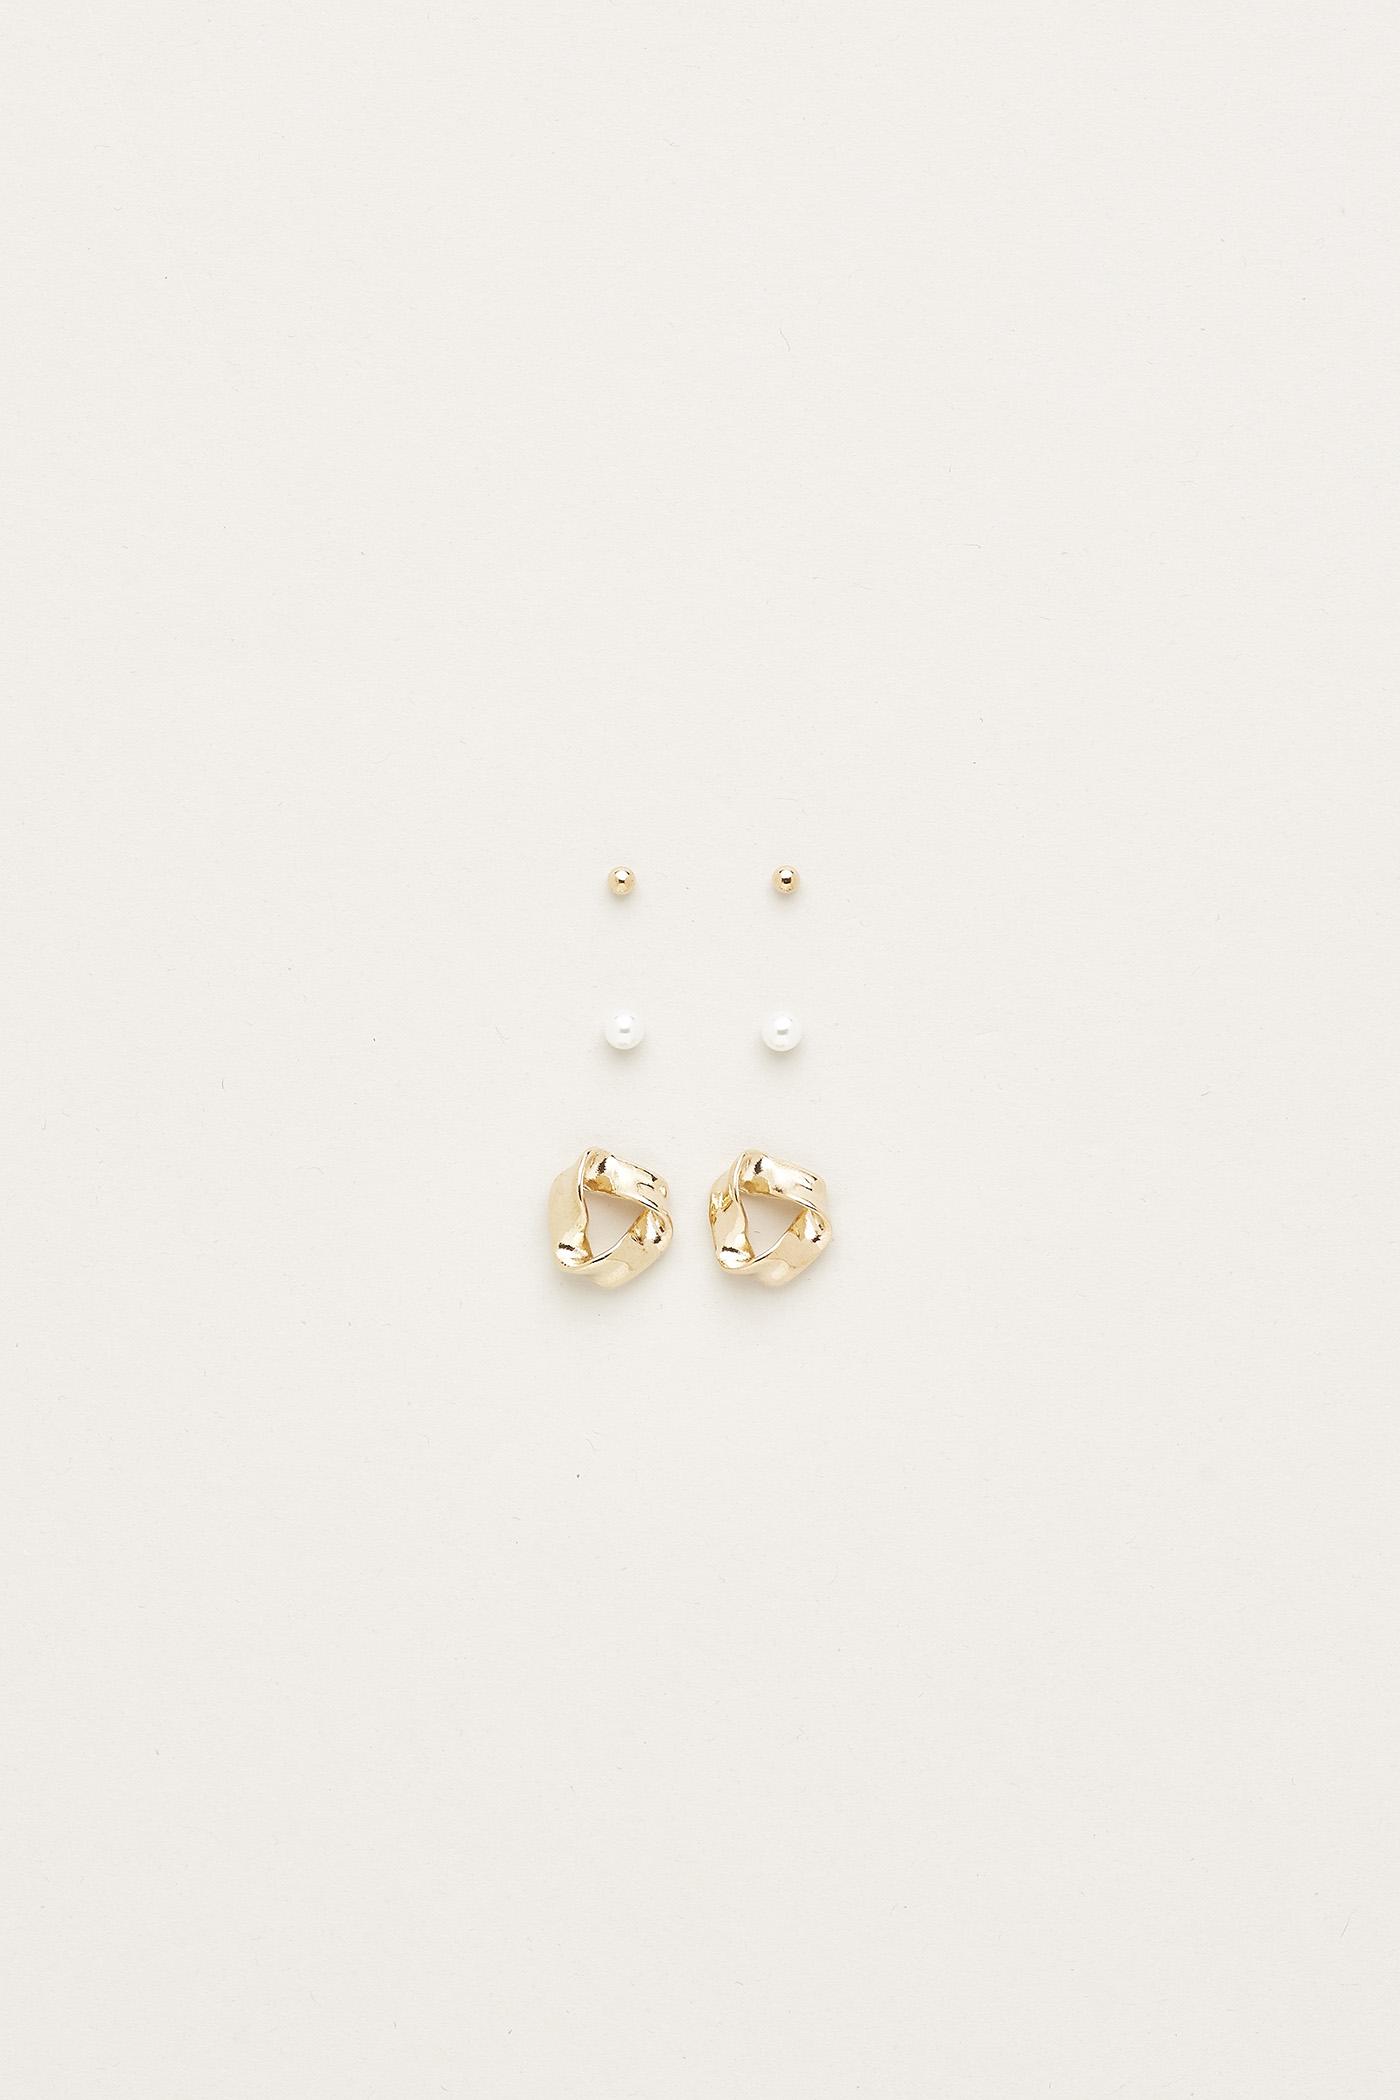 Christabel Earrings